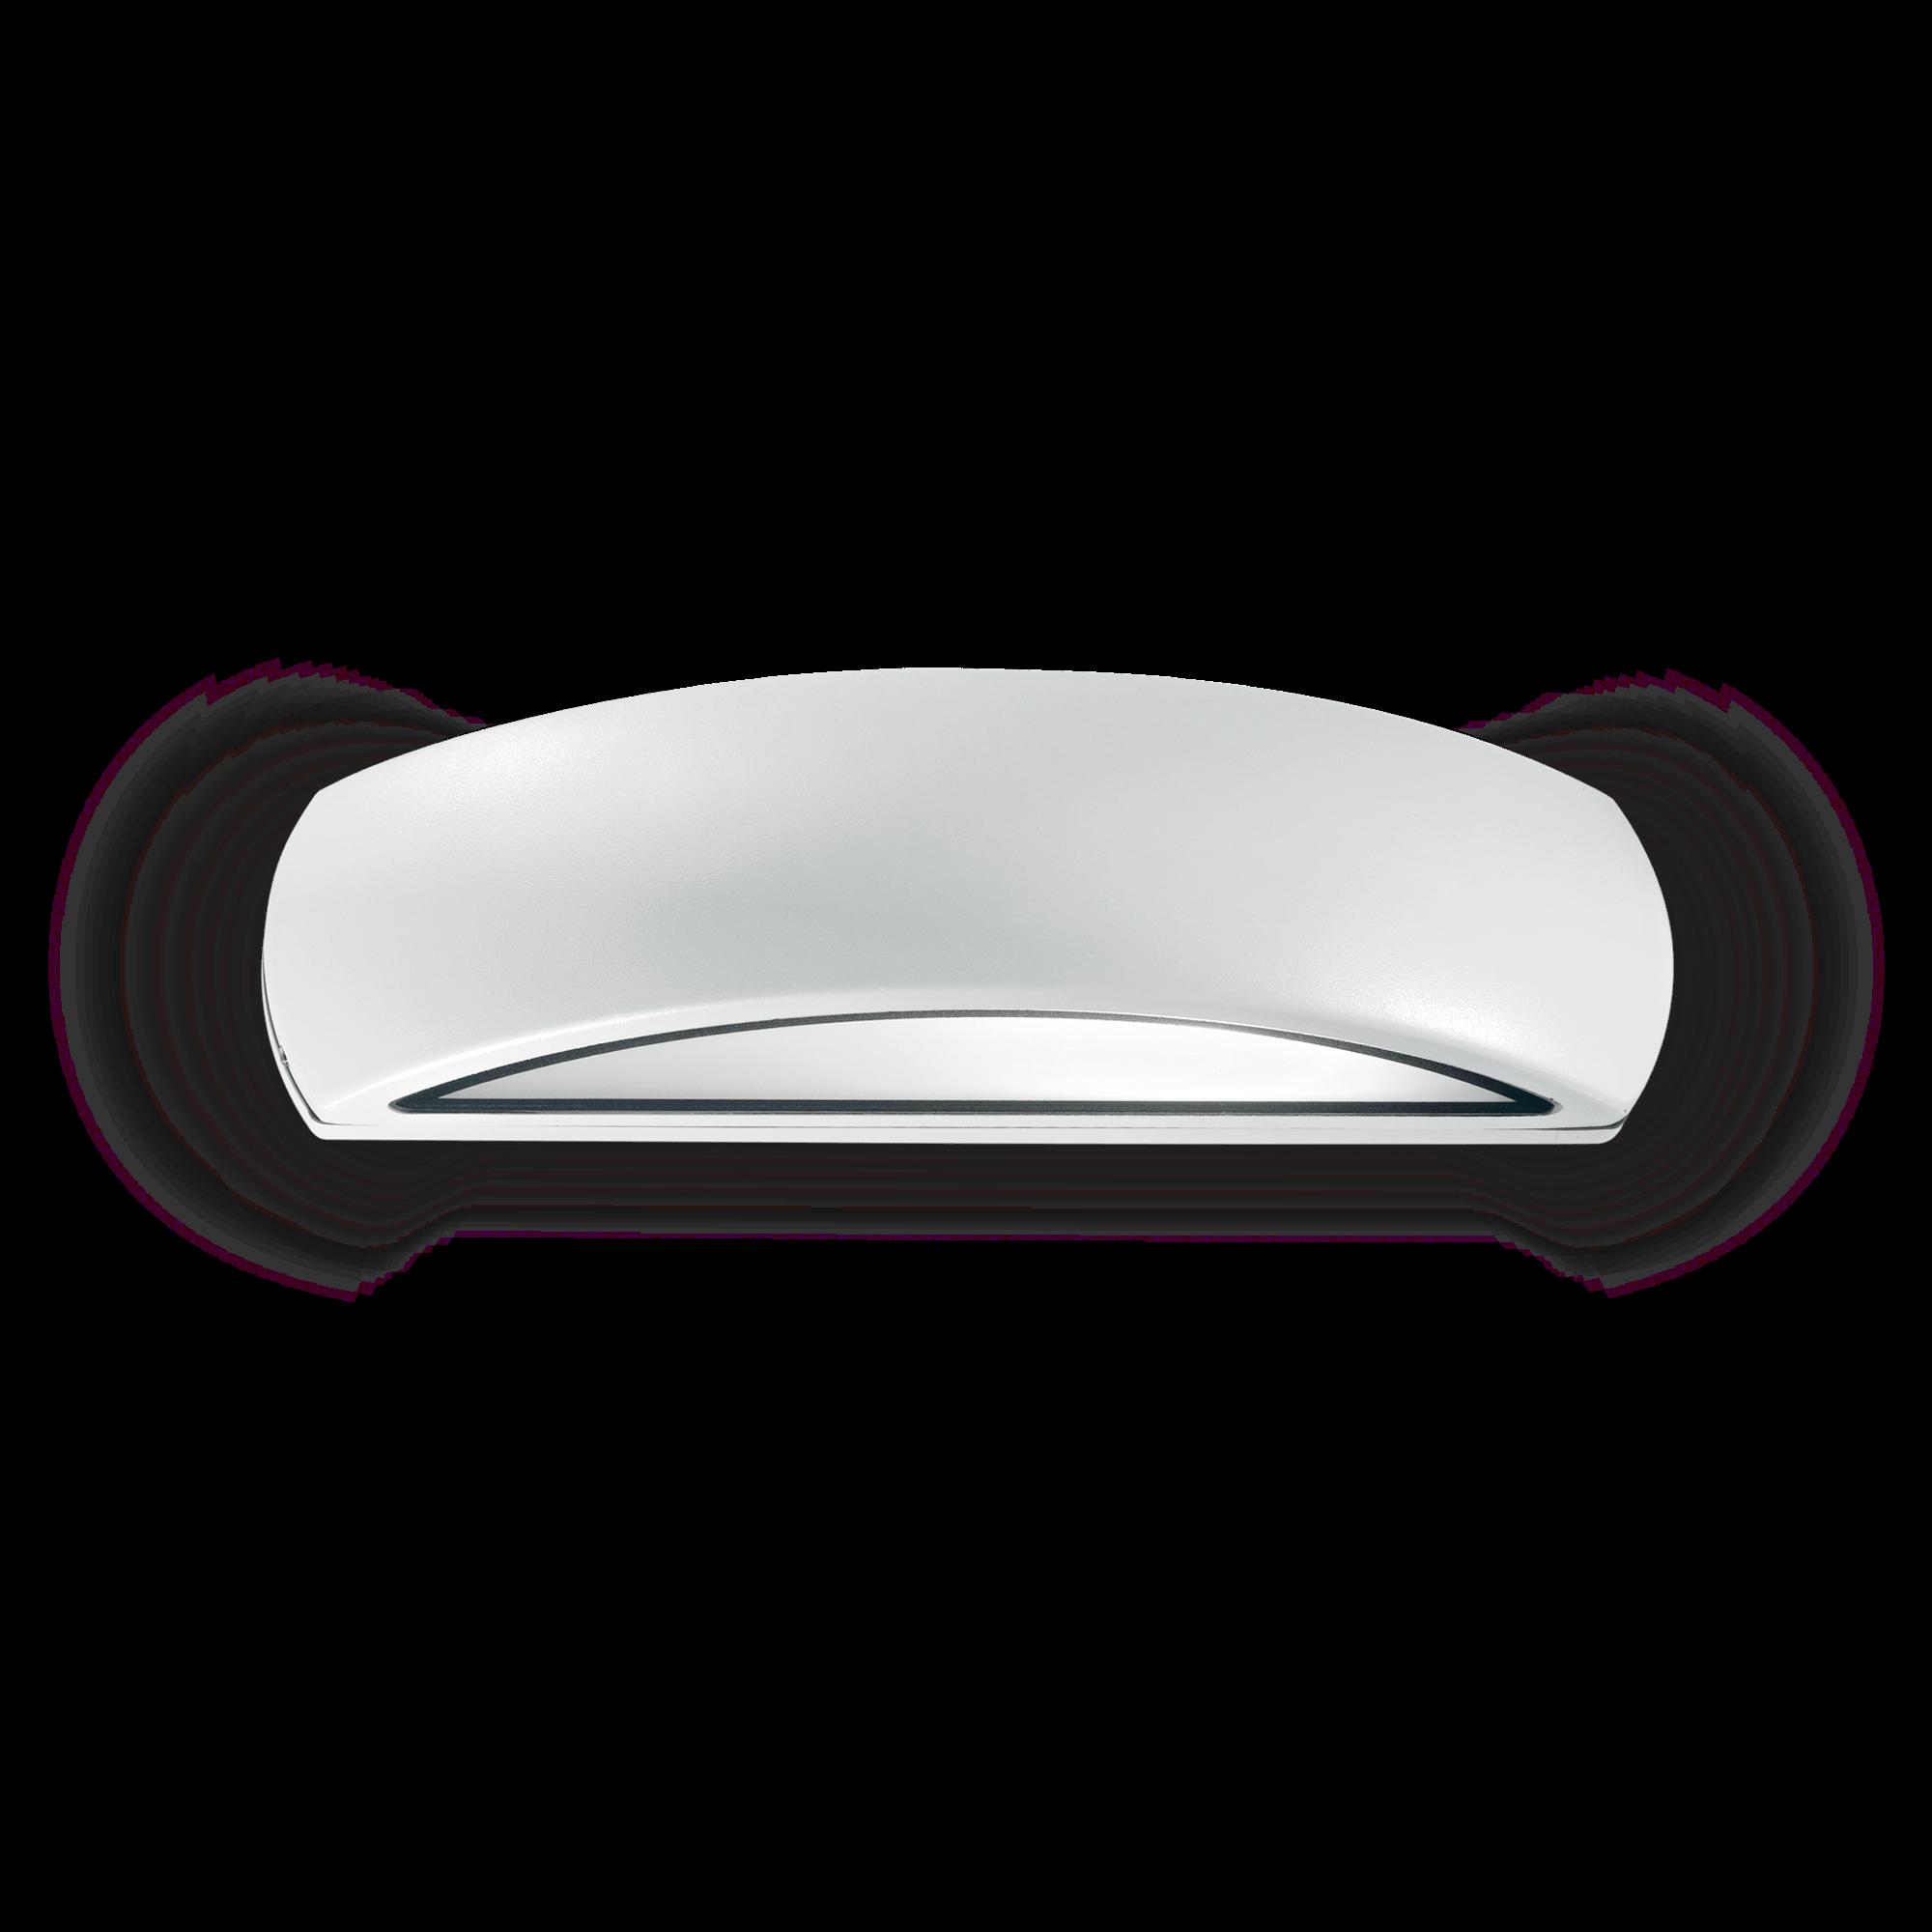 Ideal Lux 092195 Giove AP1 Bianco kültéri falilámpa